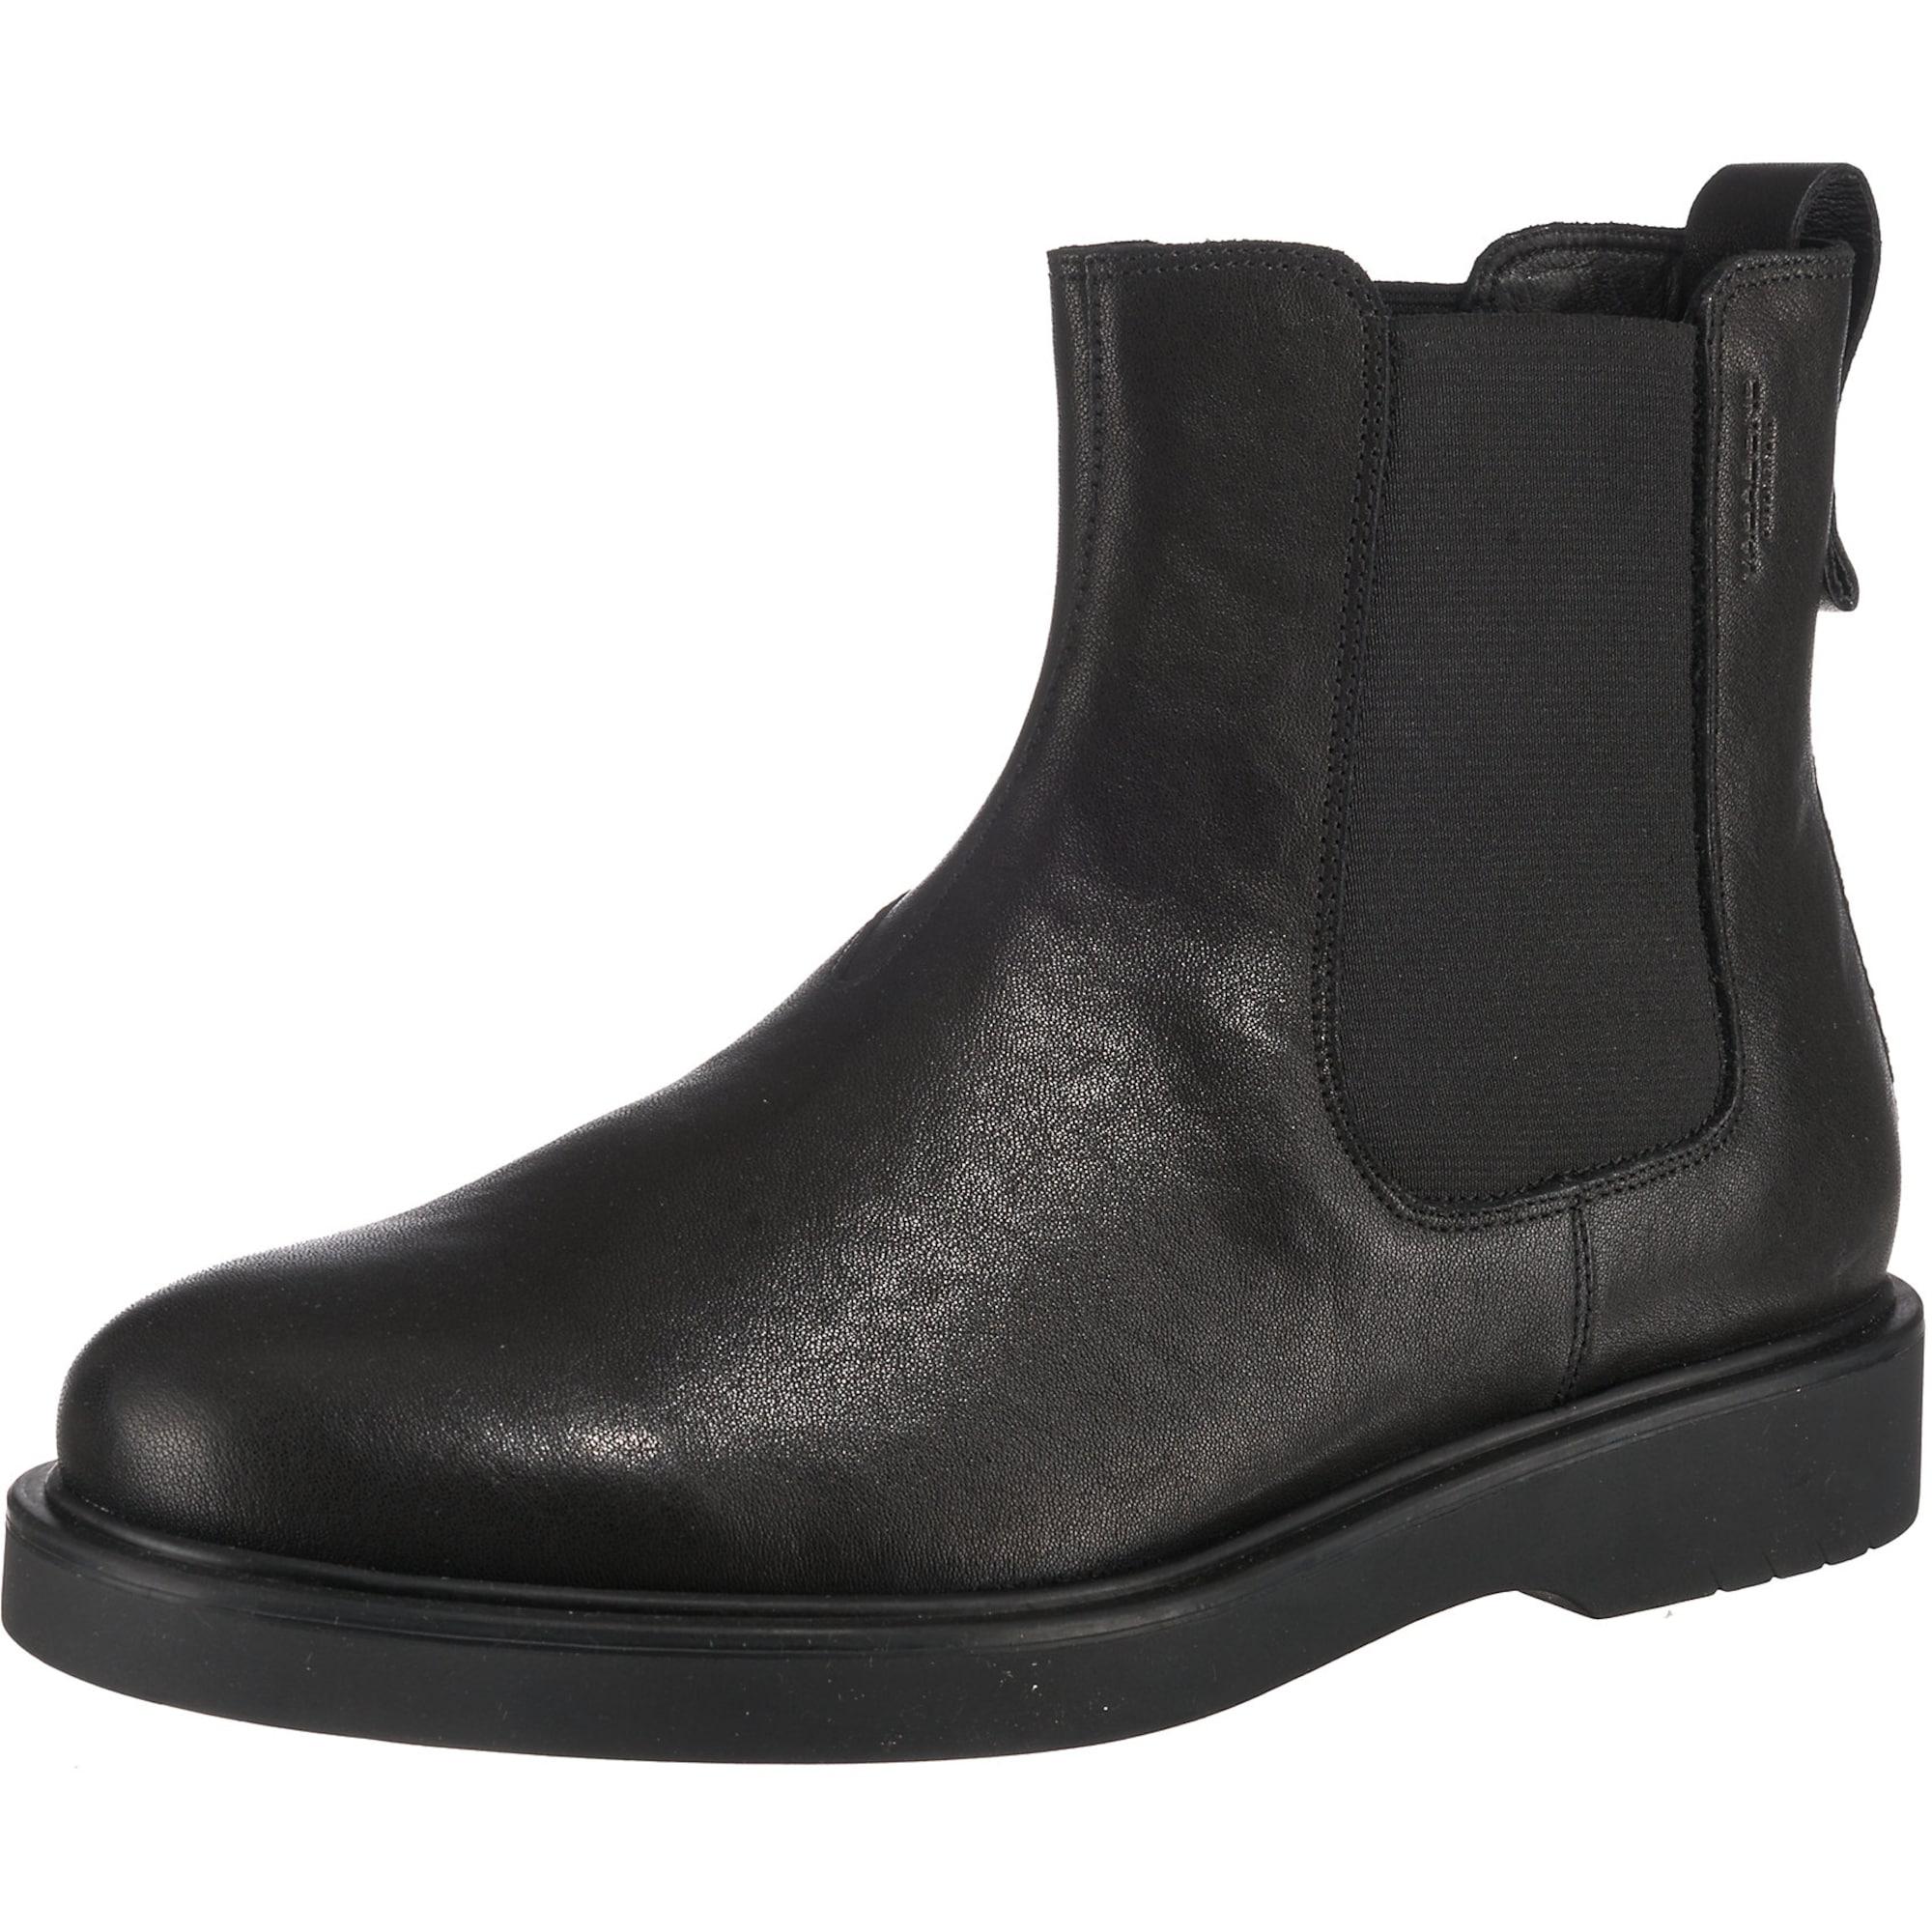 VAGABOND SHOEMAKERS Chelsea batai 'Devon' juoda